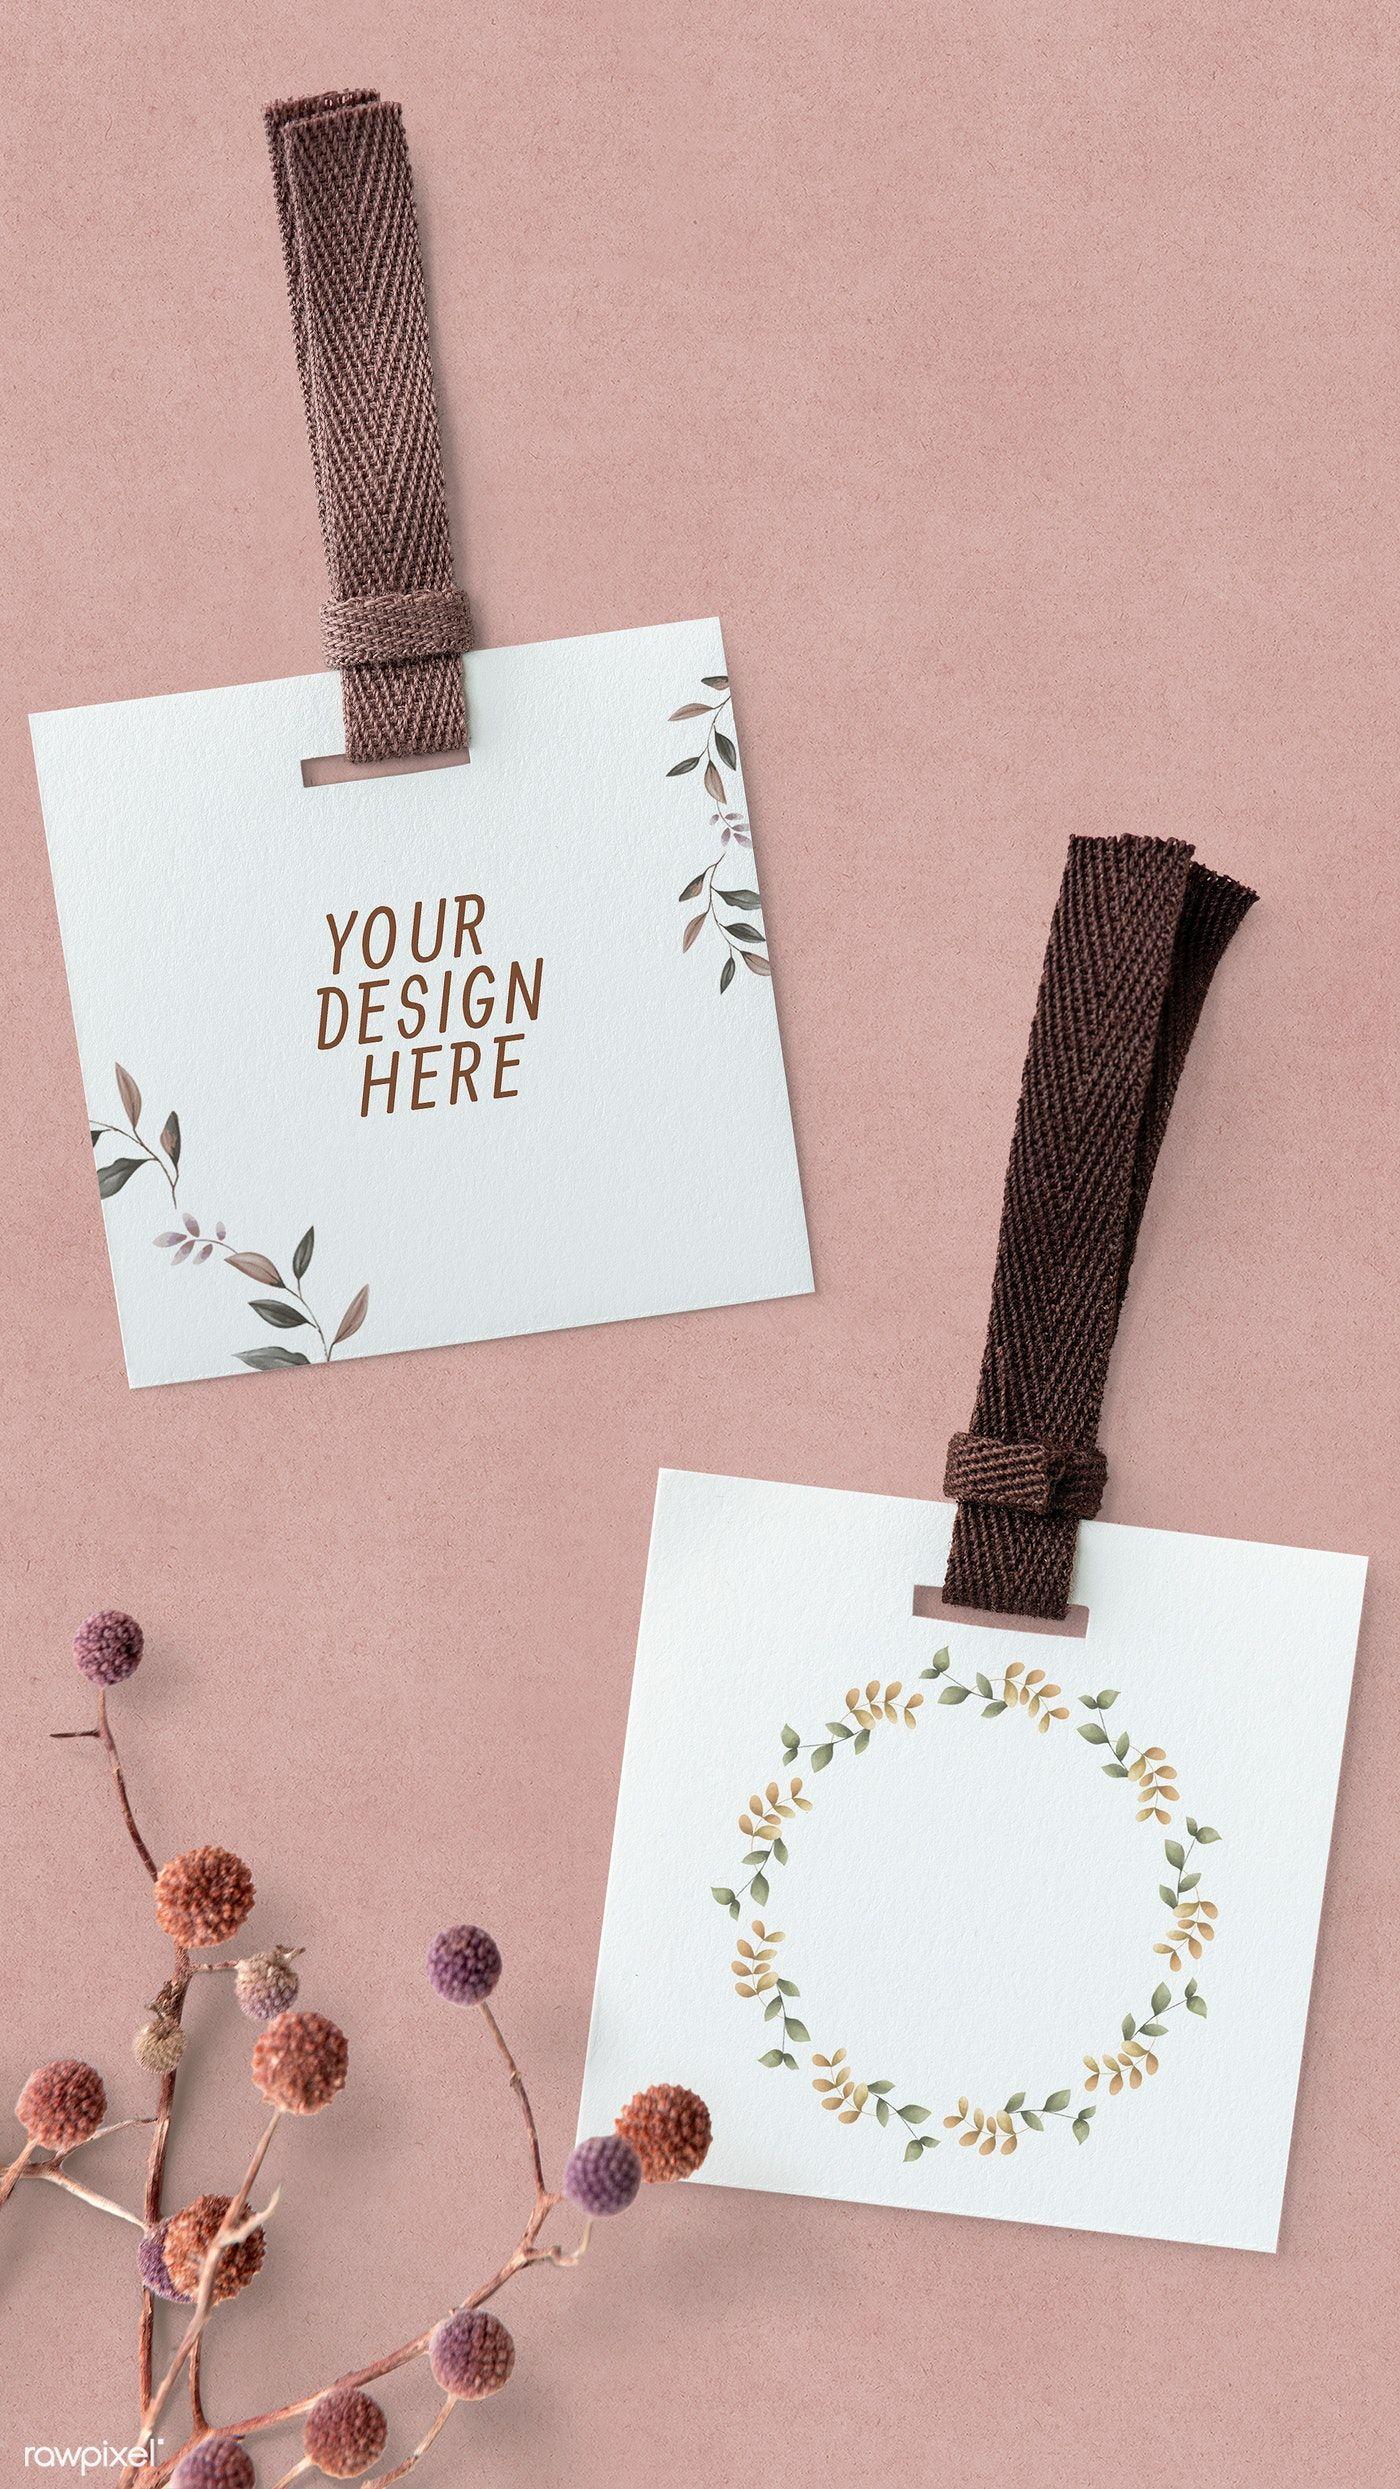 Download Download Premium Psd Of Square Label Mockup Mobile Wallpaper Illustration Handmade Packaging Branding Design Packaging Tag Design